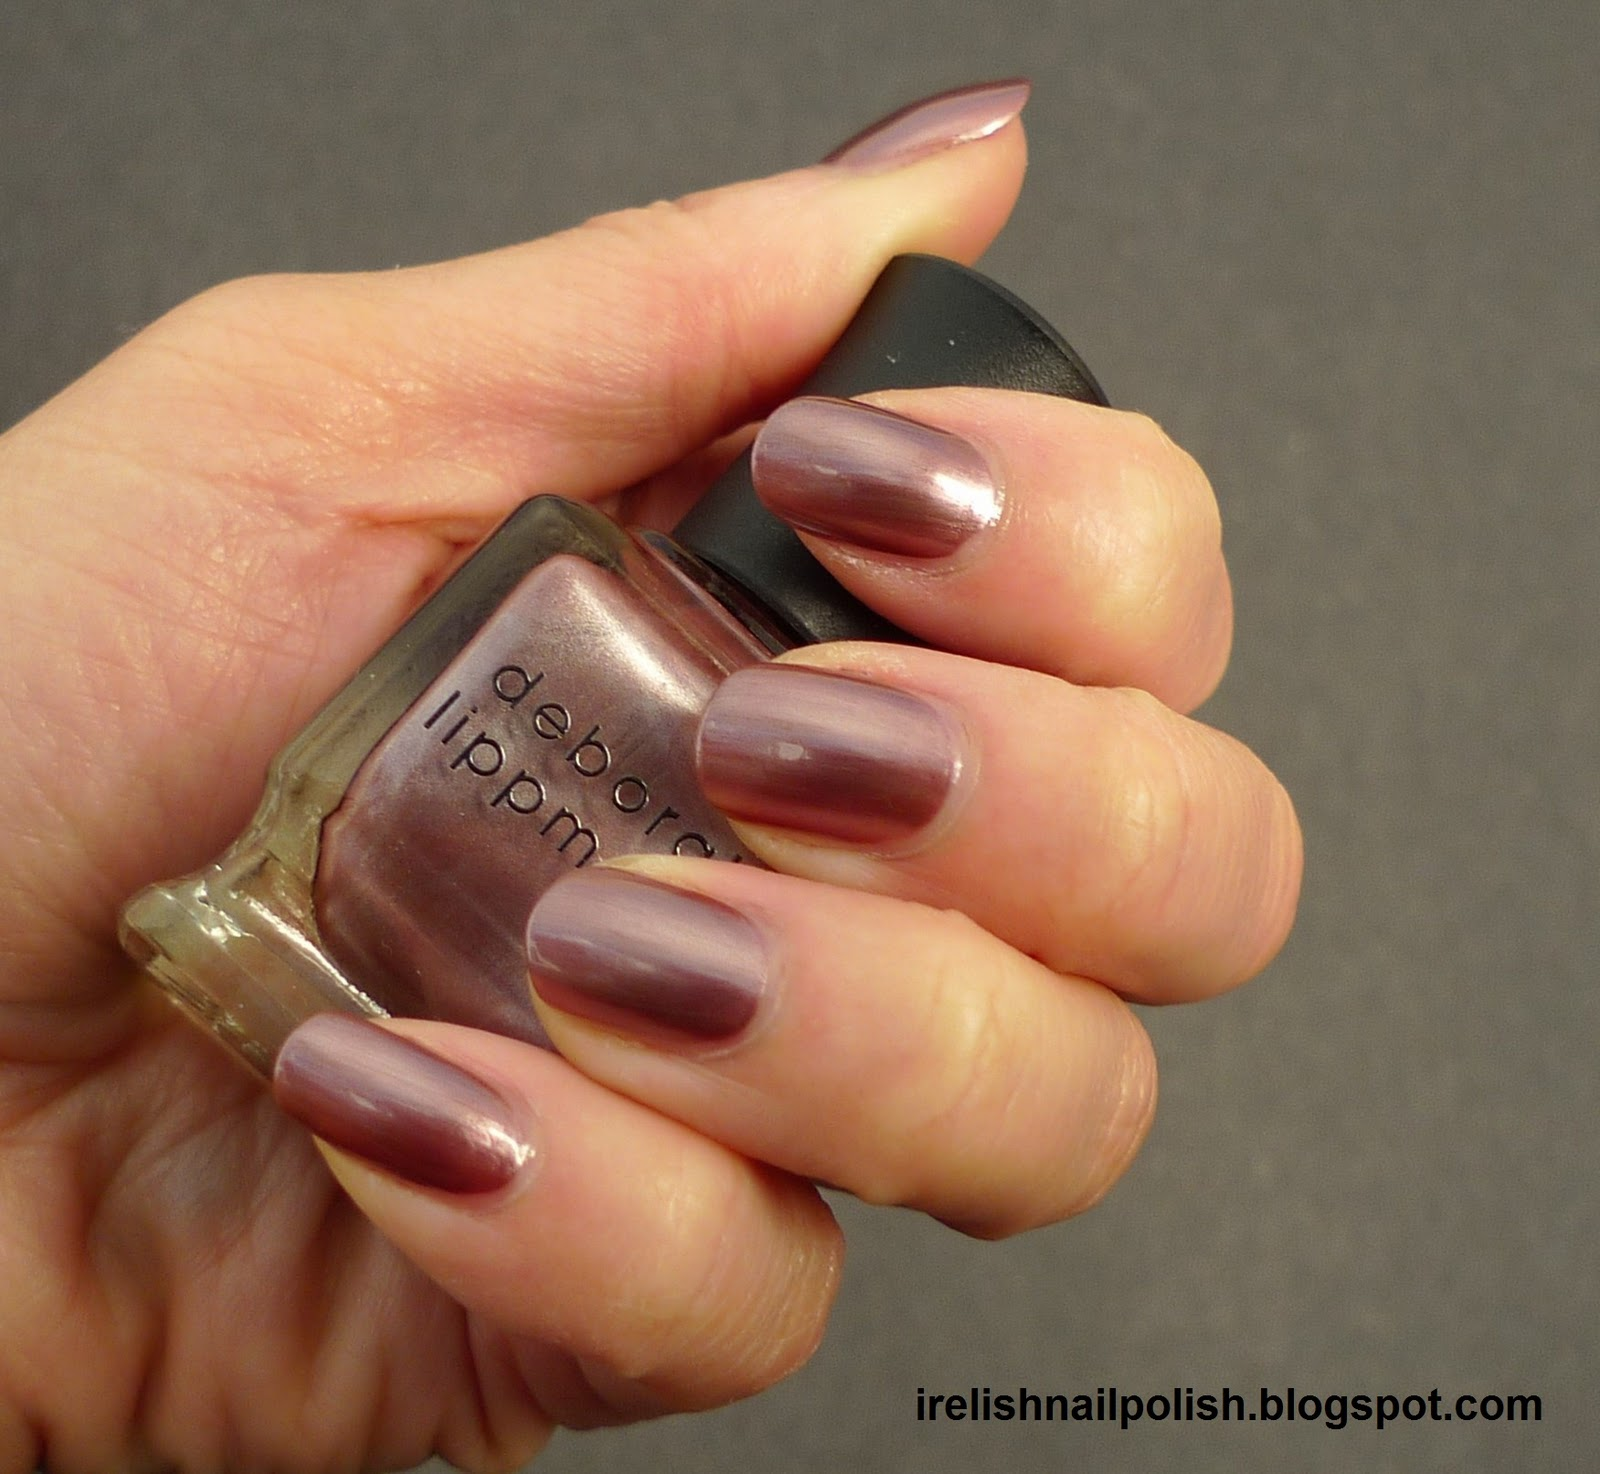 I Relish Nail Polish!: Deborah Lippmann - Sweet Spot